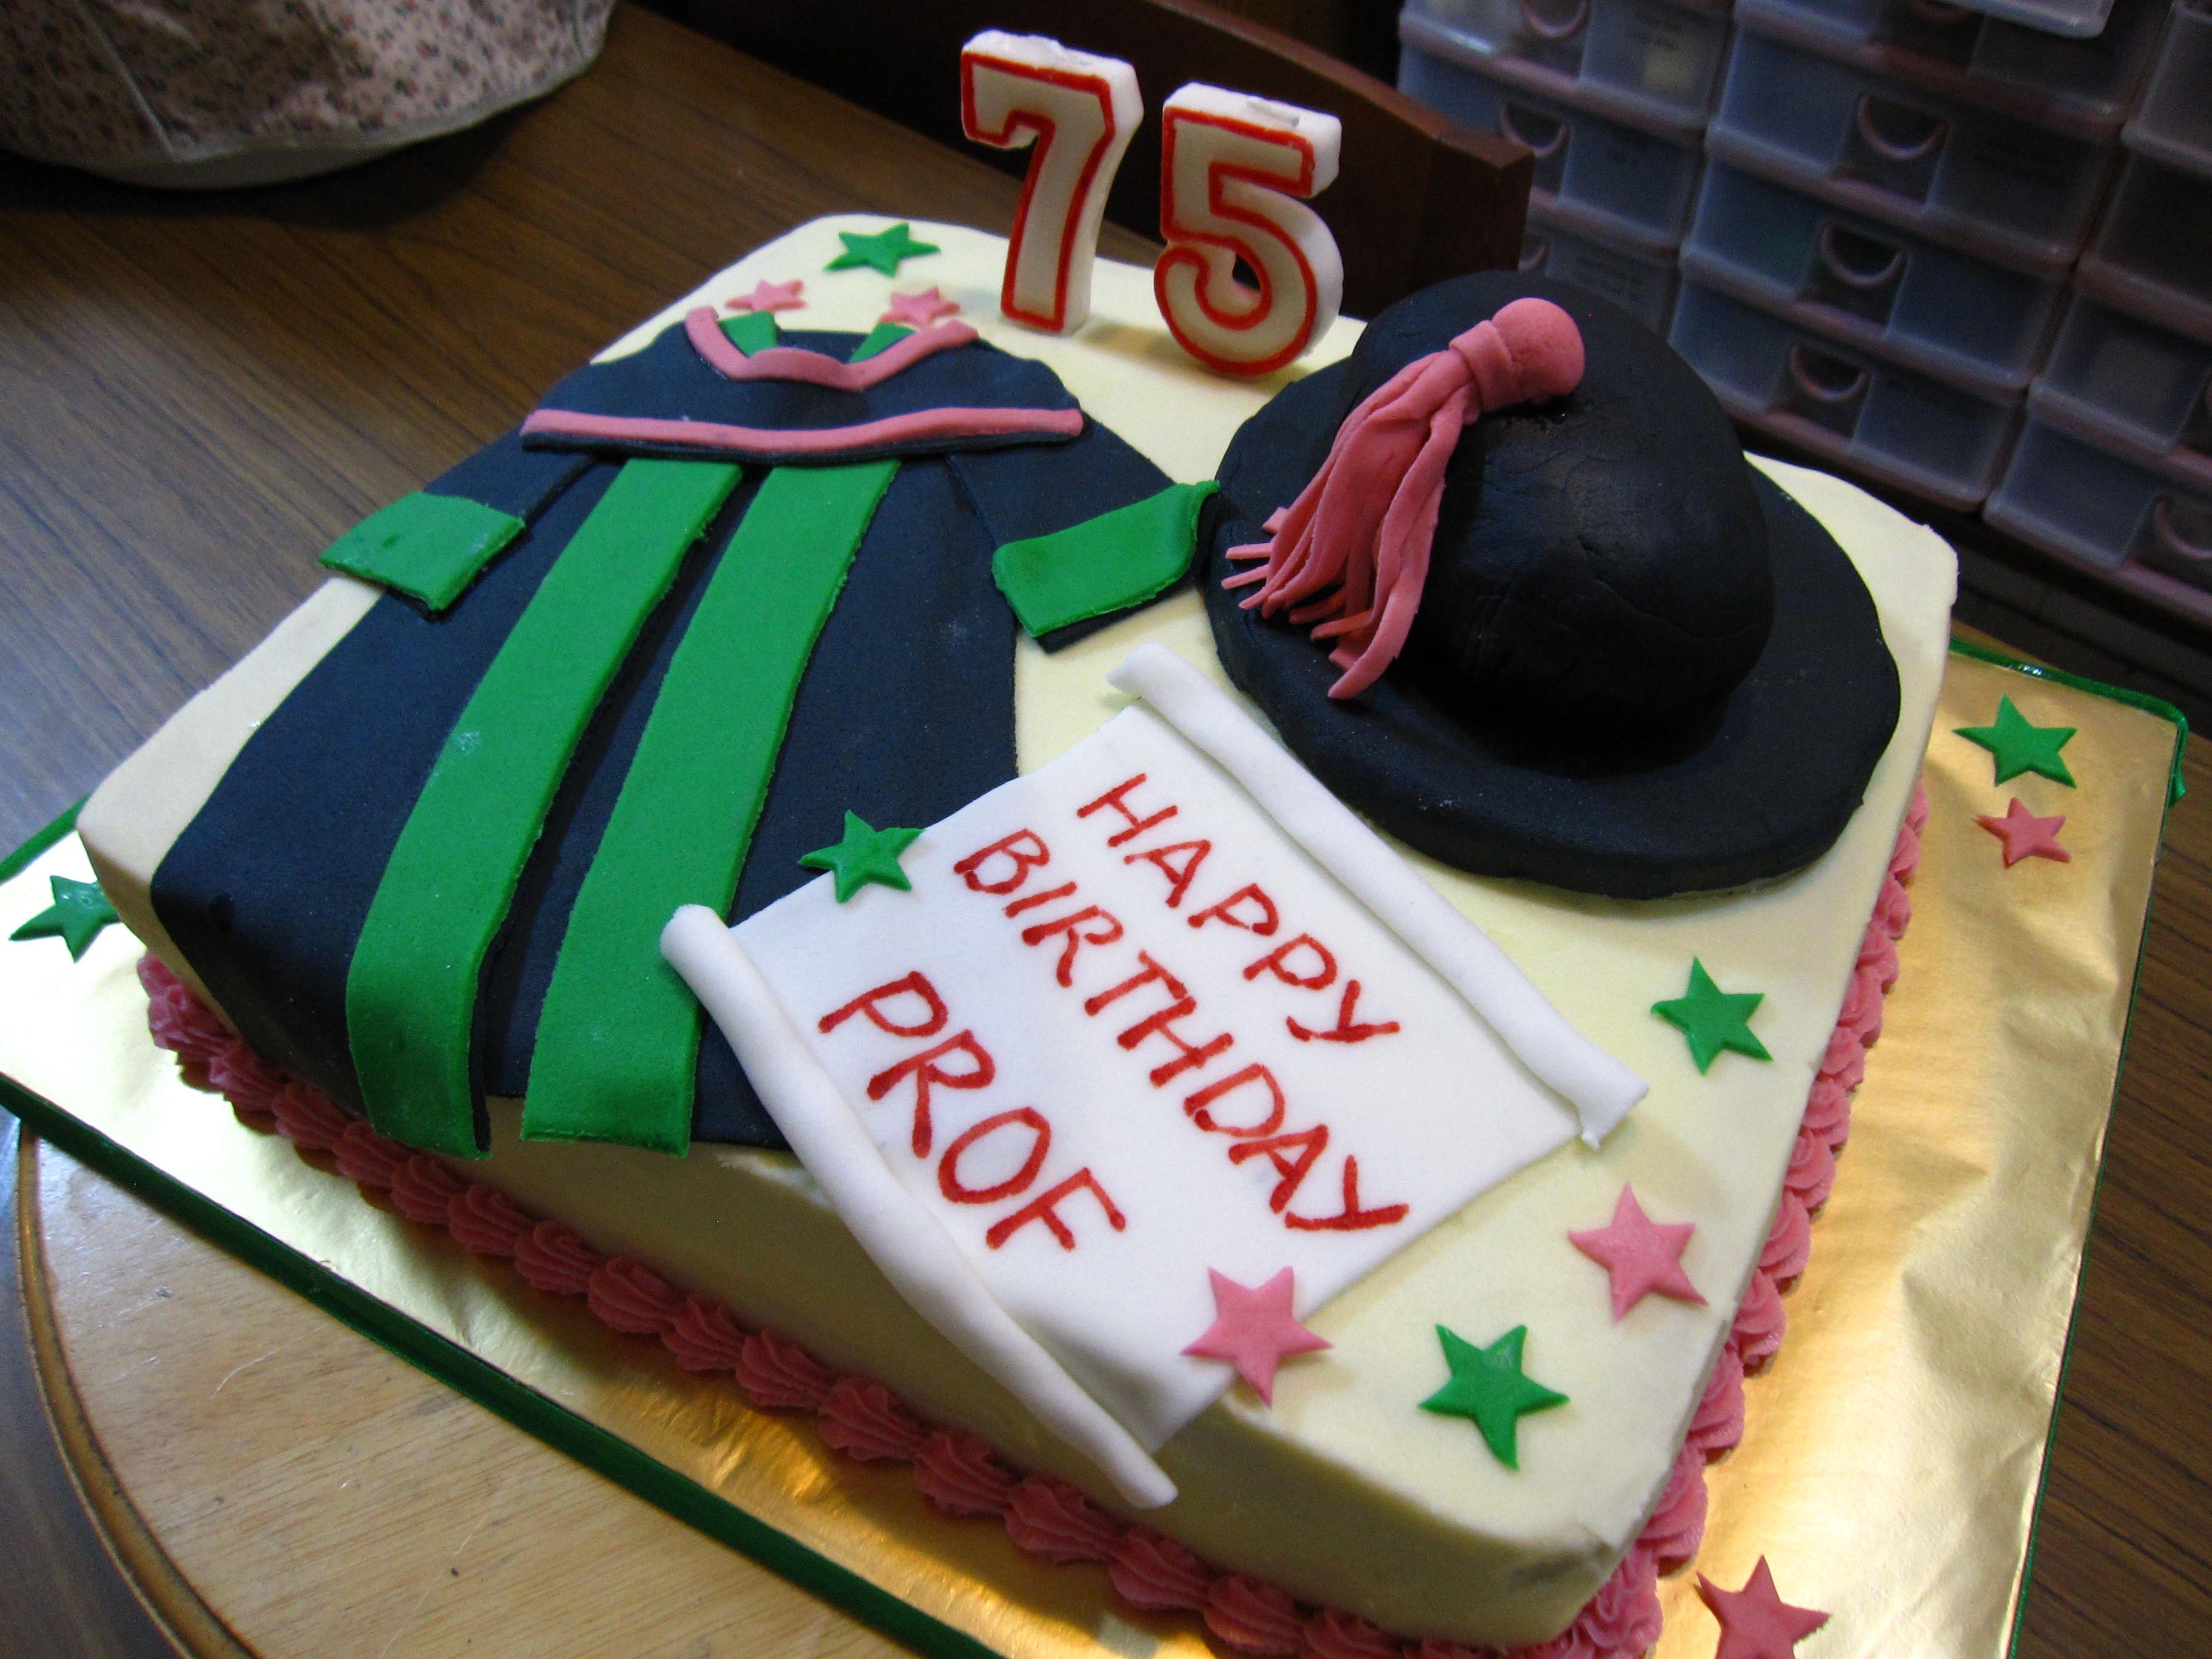 Professor Emeritus Birthday Cake